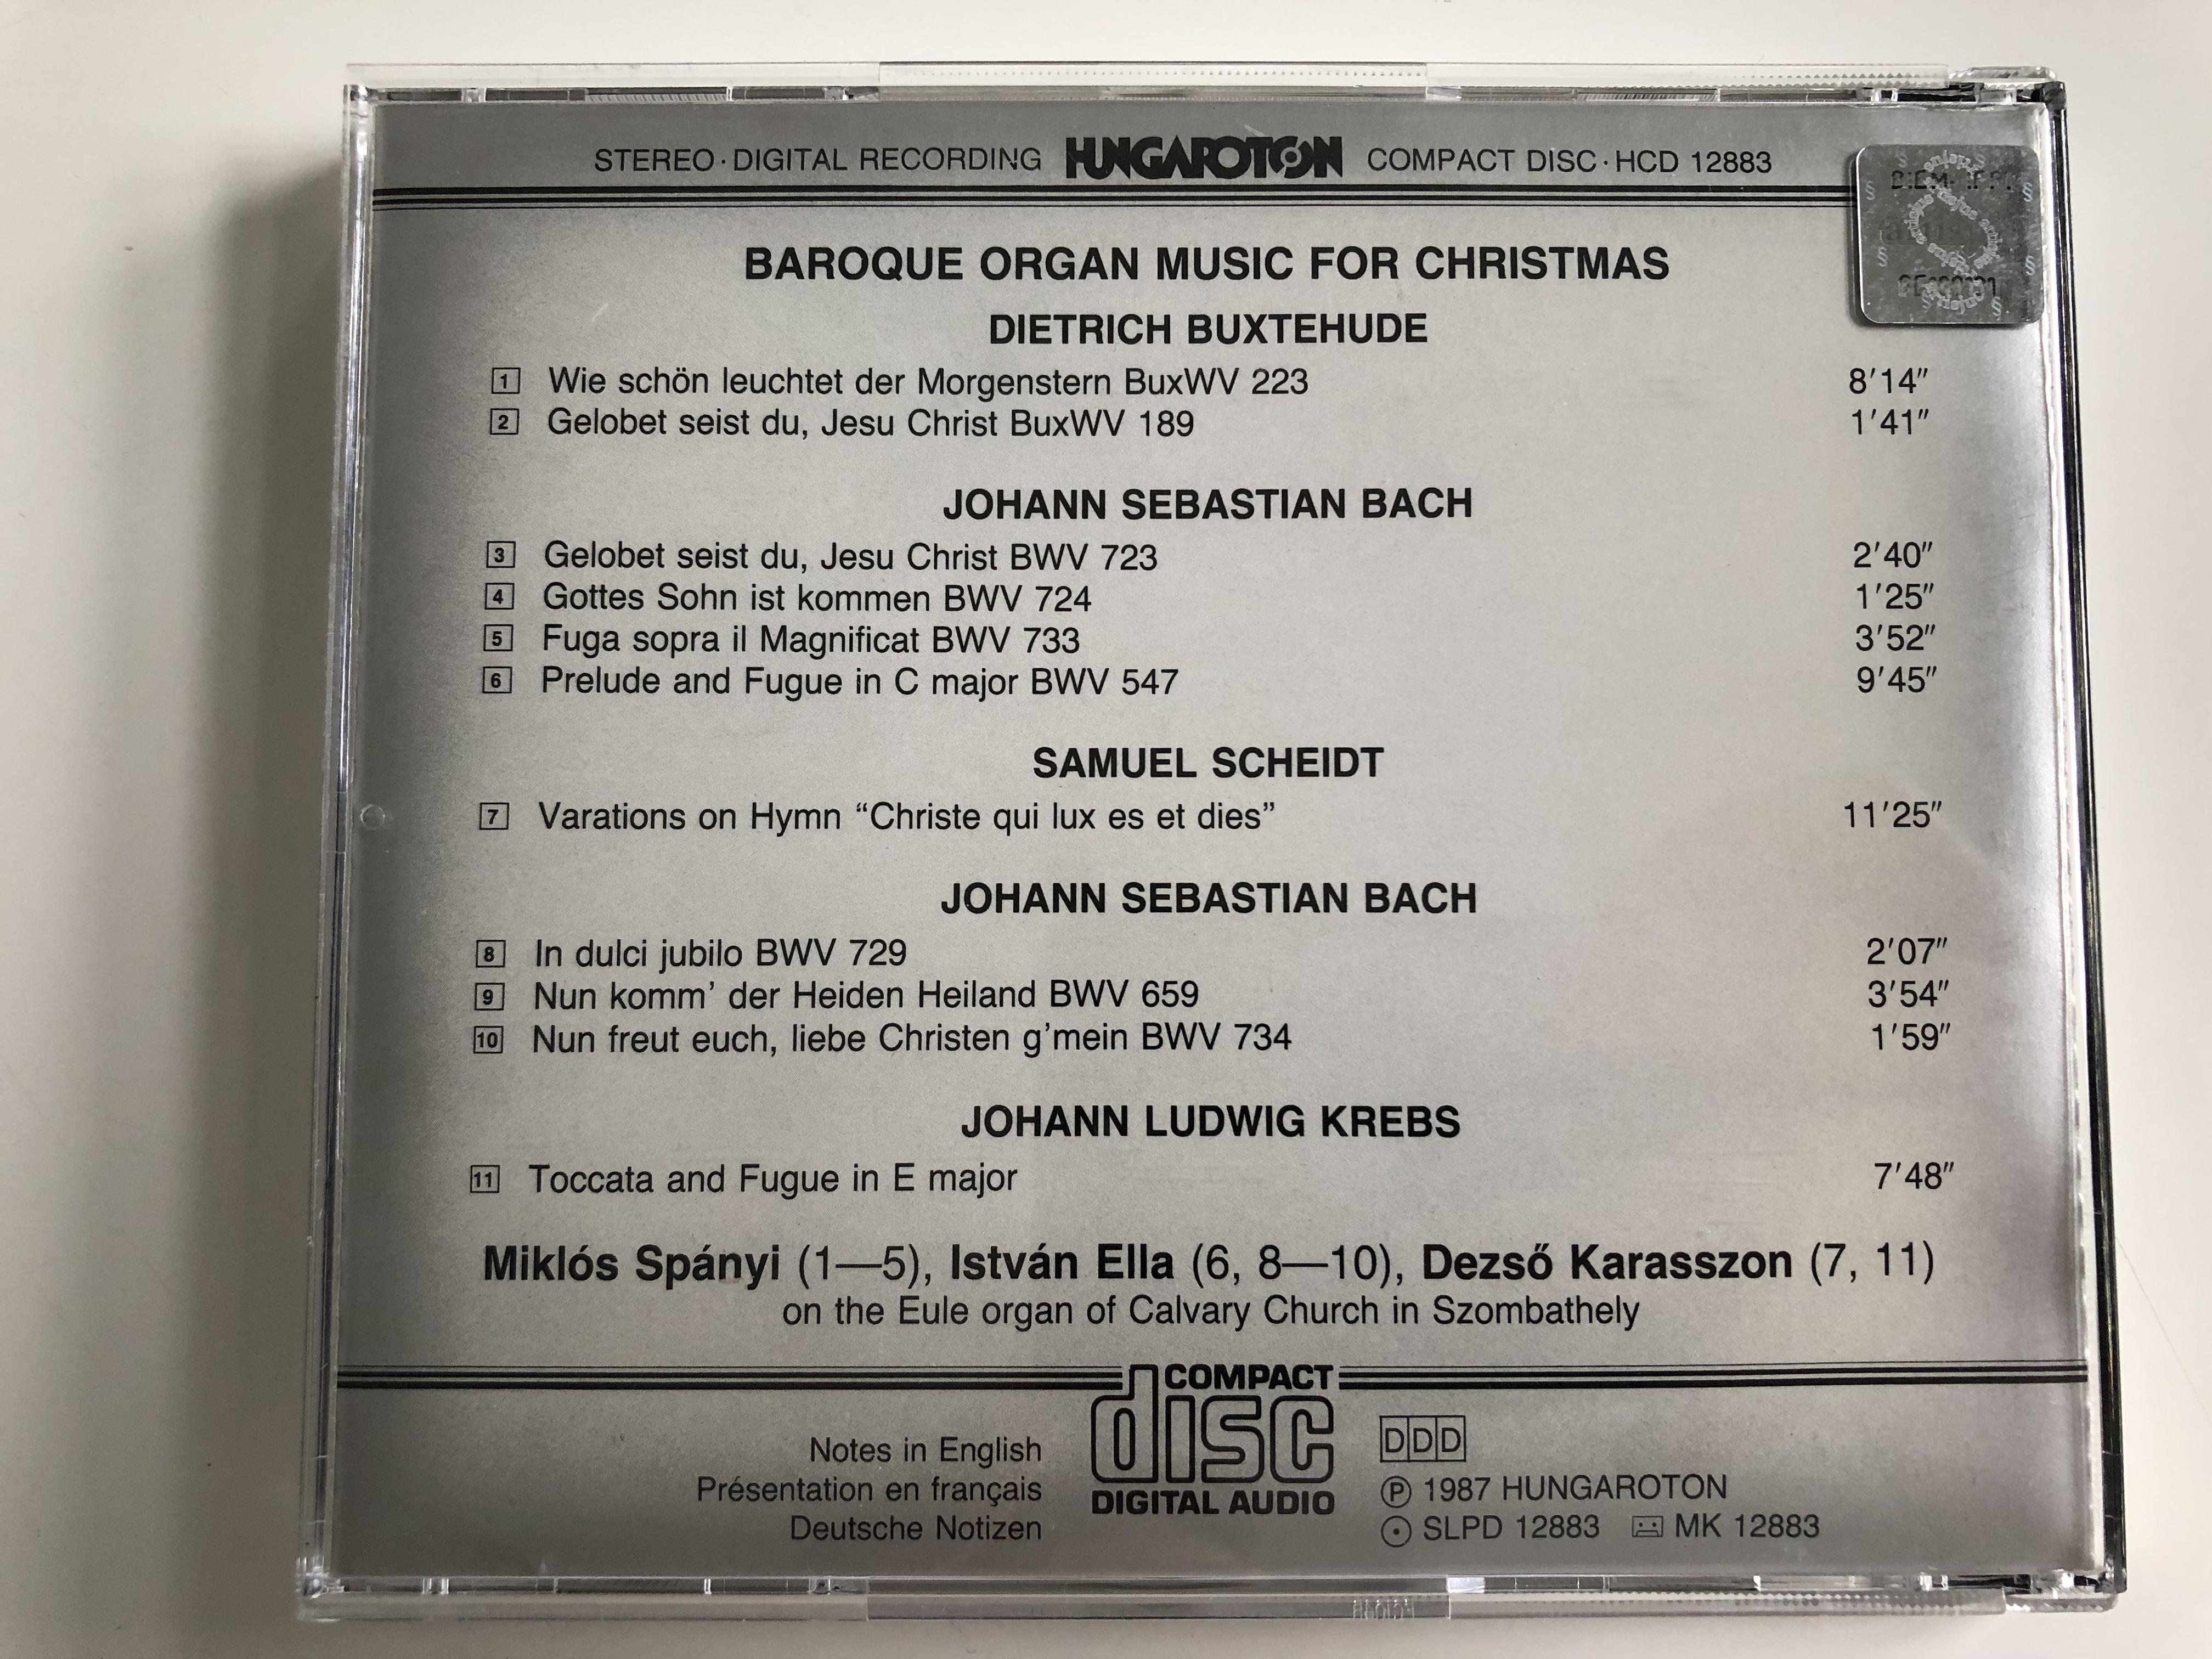 baroque-organ-music-for-christmas-bach-buxtehude-scheidt-krebs-miklos-spanyi-istv-n-ella-dezs-karasszon-hungaroton-audio-cd-1995-stereo-hcd-12883-7-.jpg